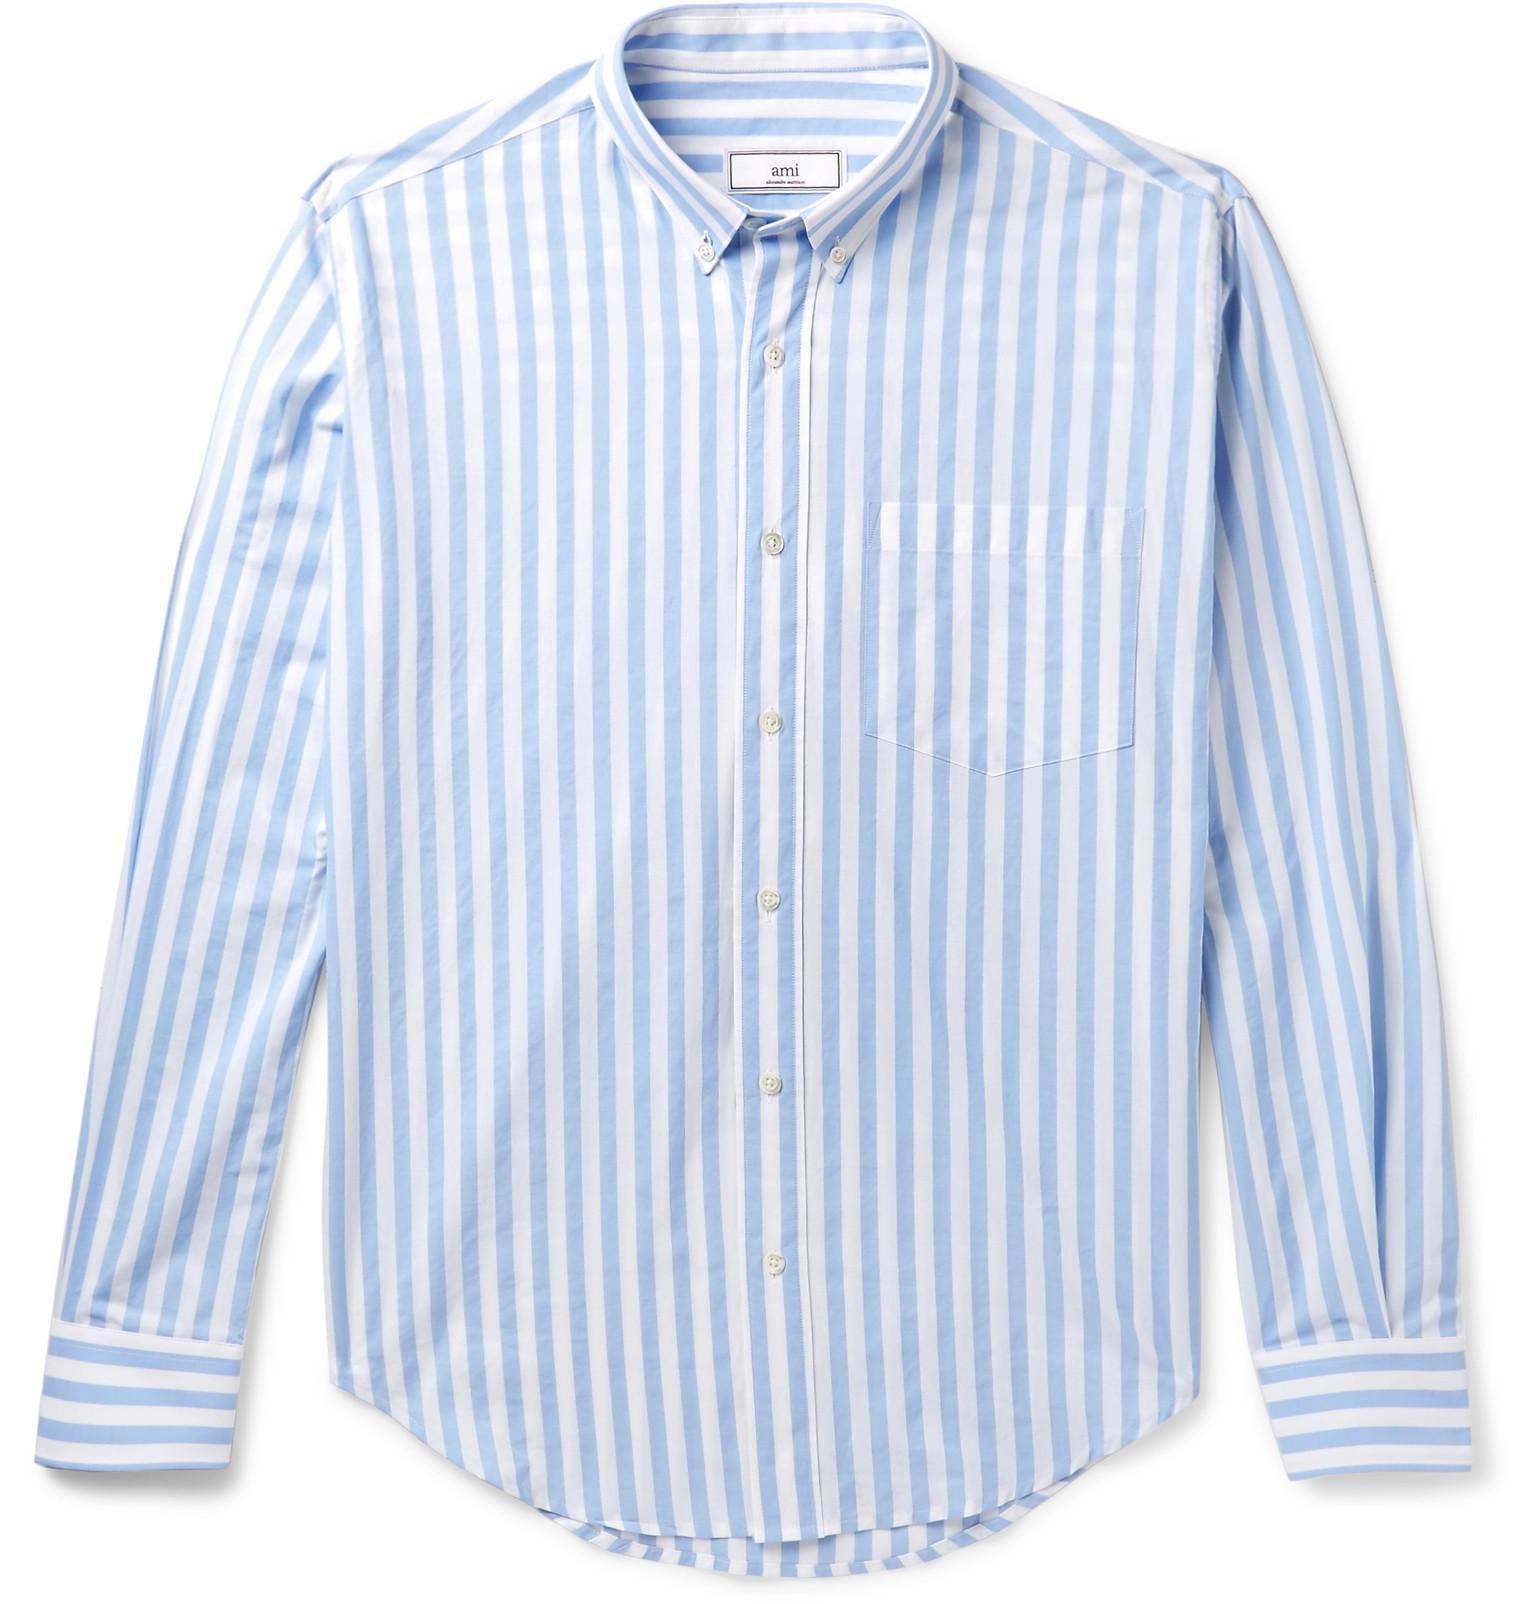 Ami button down collar striped cotton shirt in blue for for Striped button down shirts for men